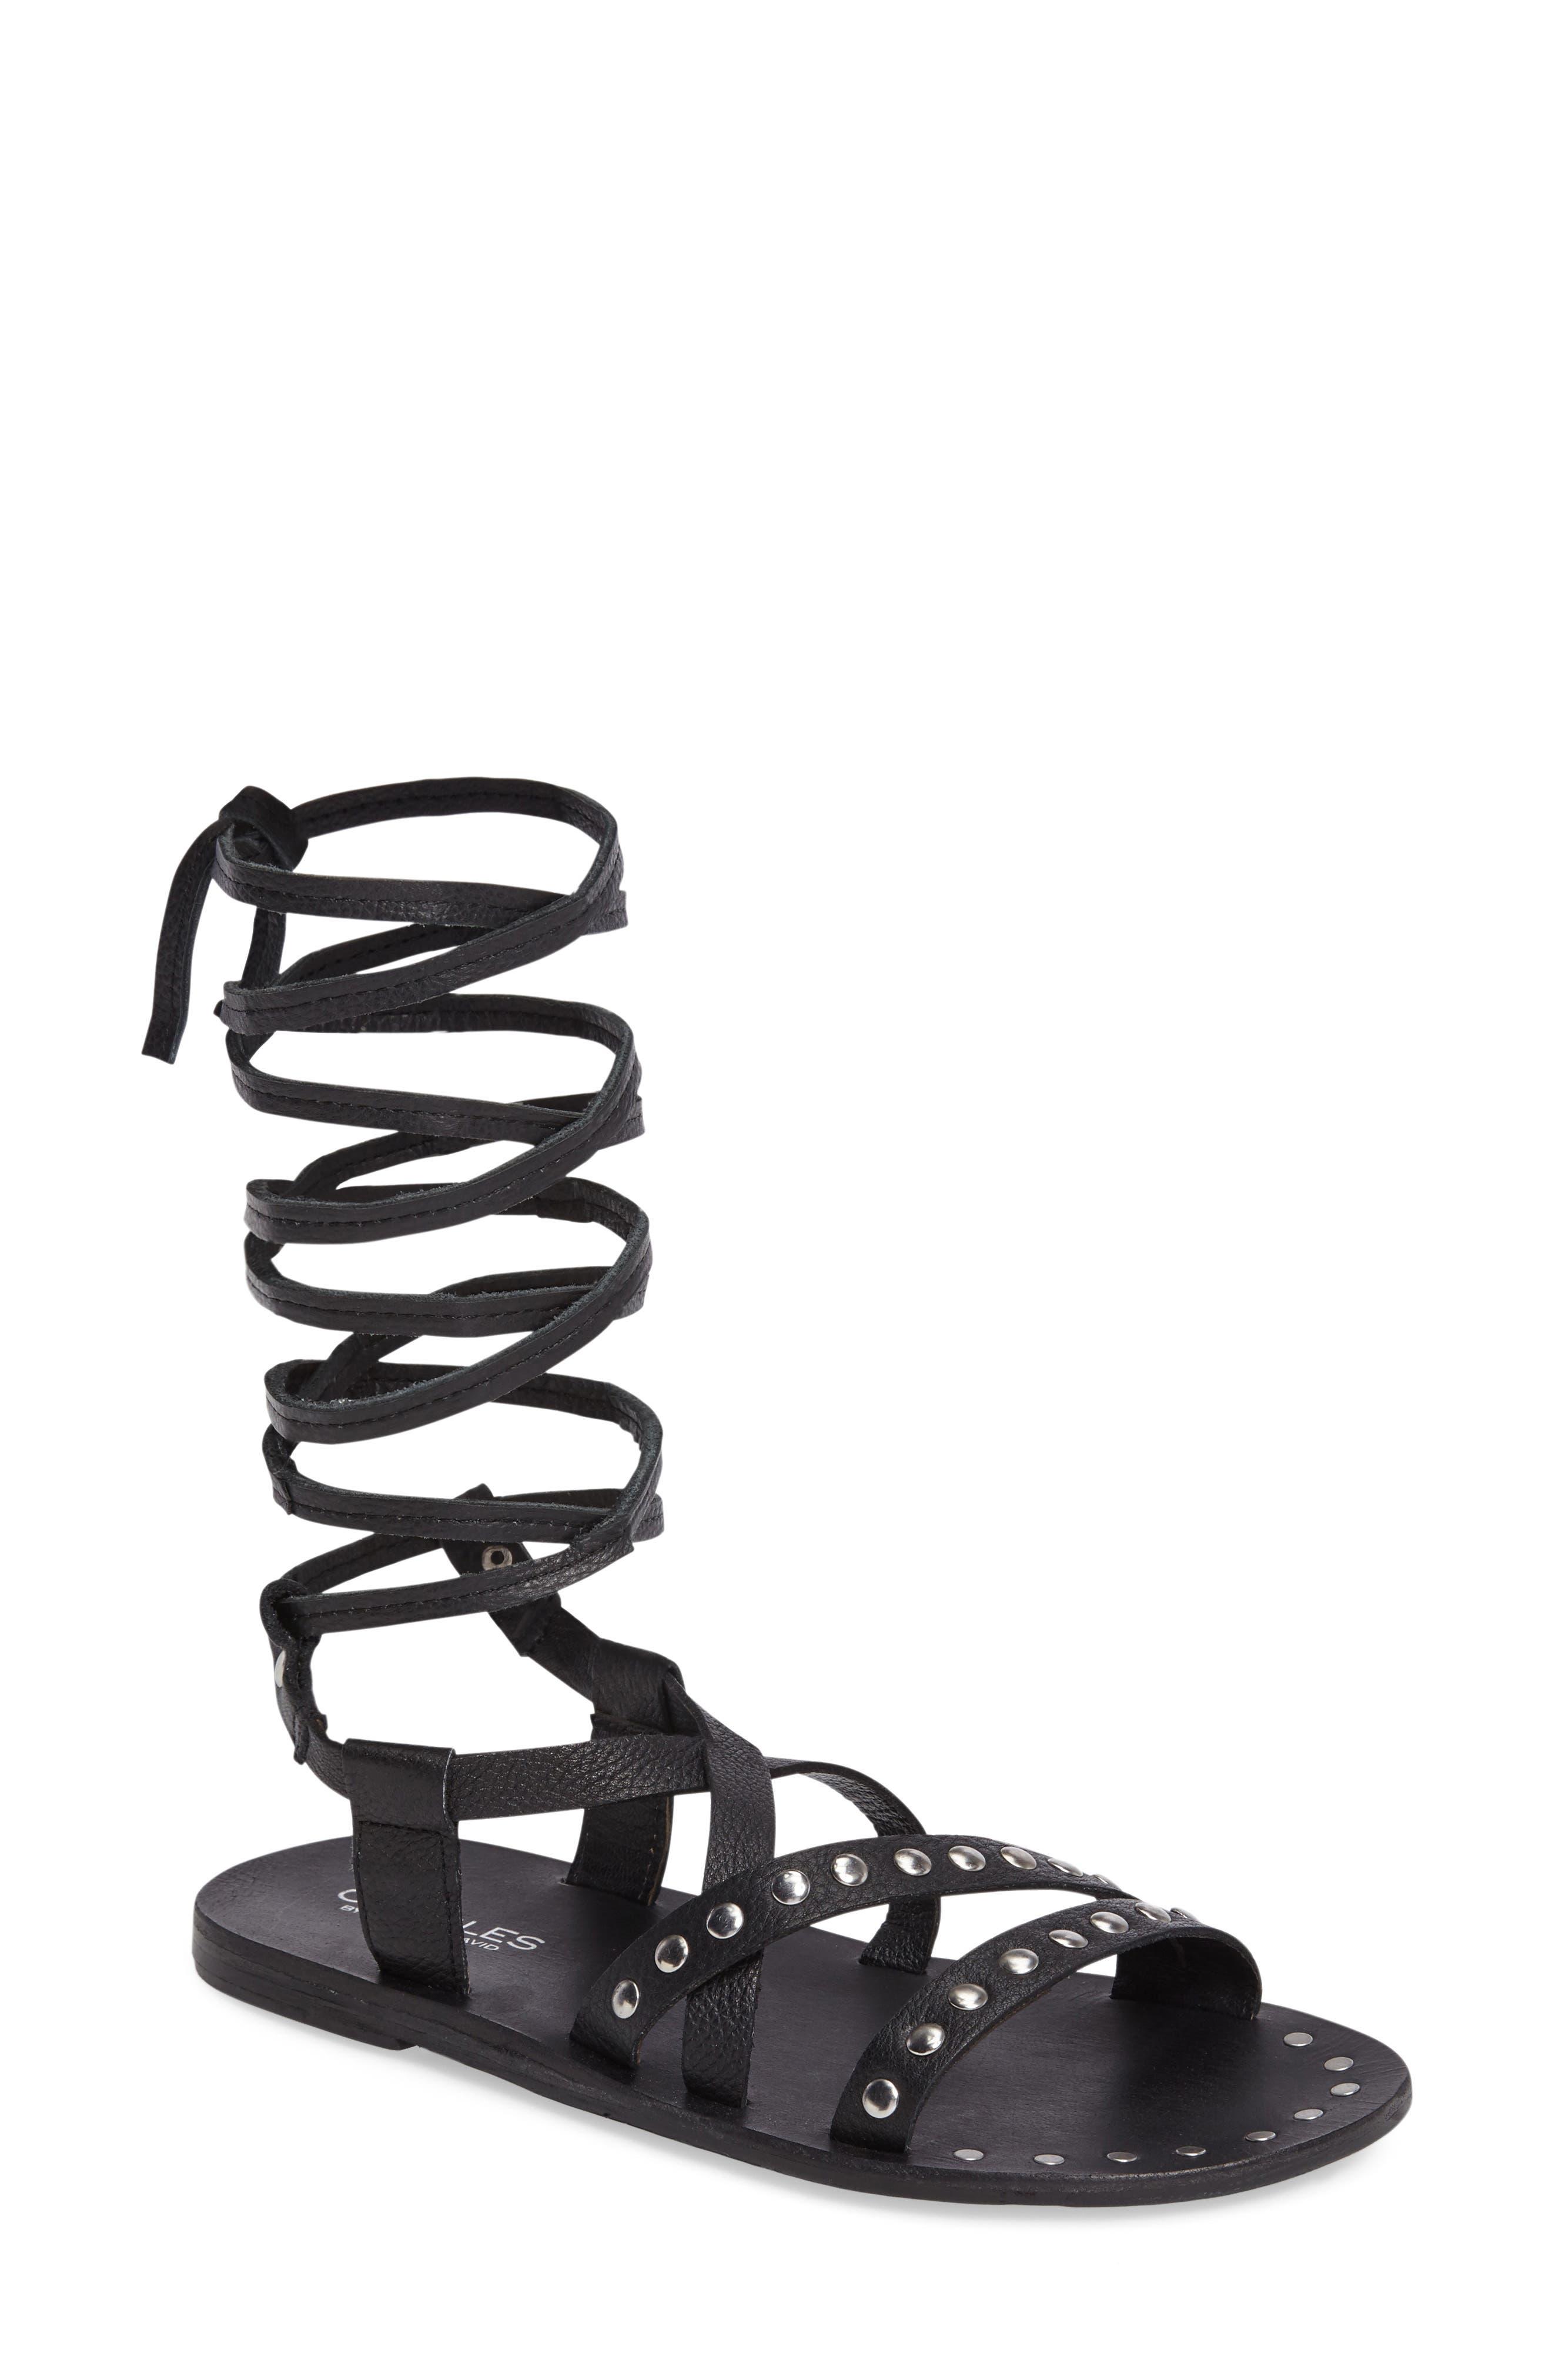 Steeler Ankle Wrap Sandal,                         Main,                         color, 001